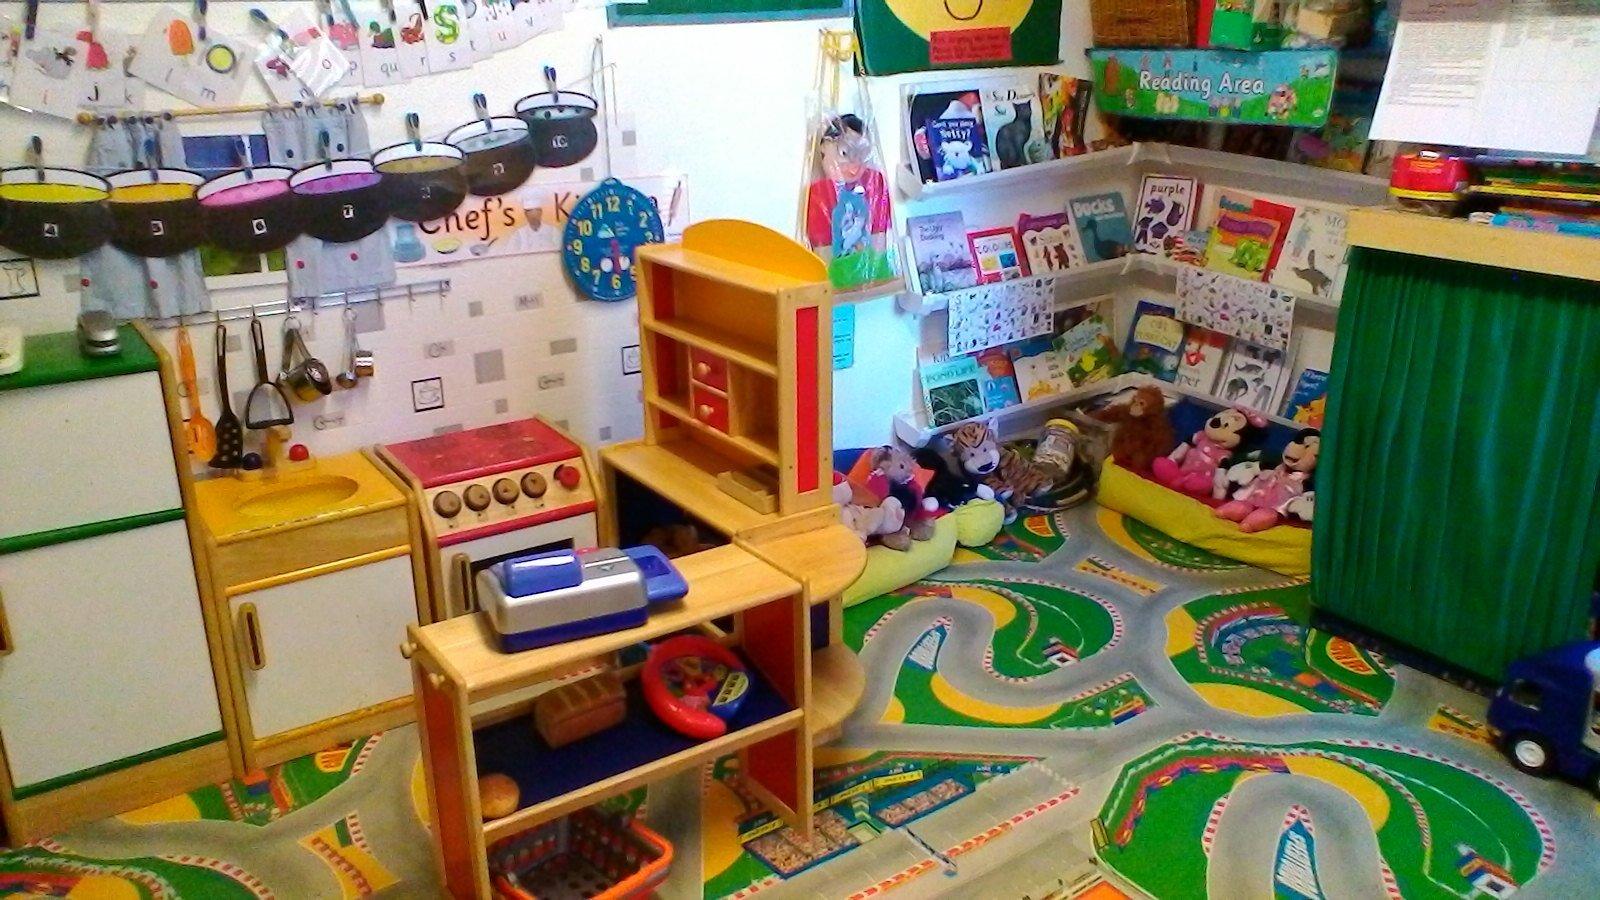 Kids Inc Childrens Play Area